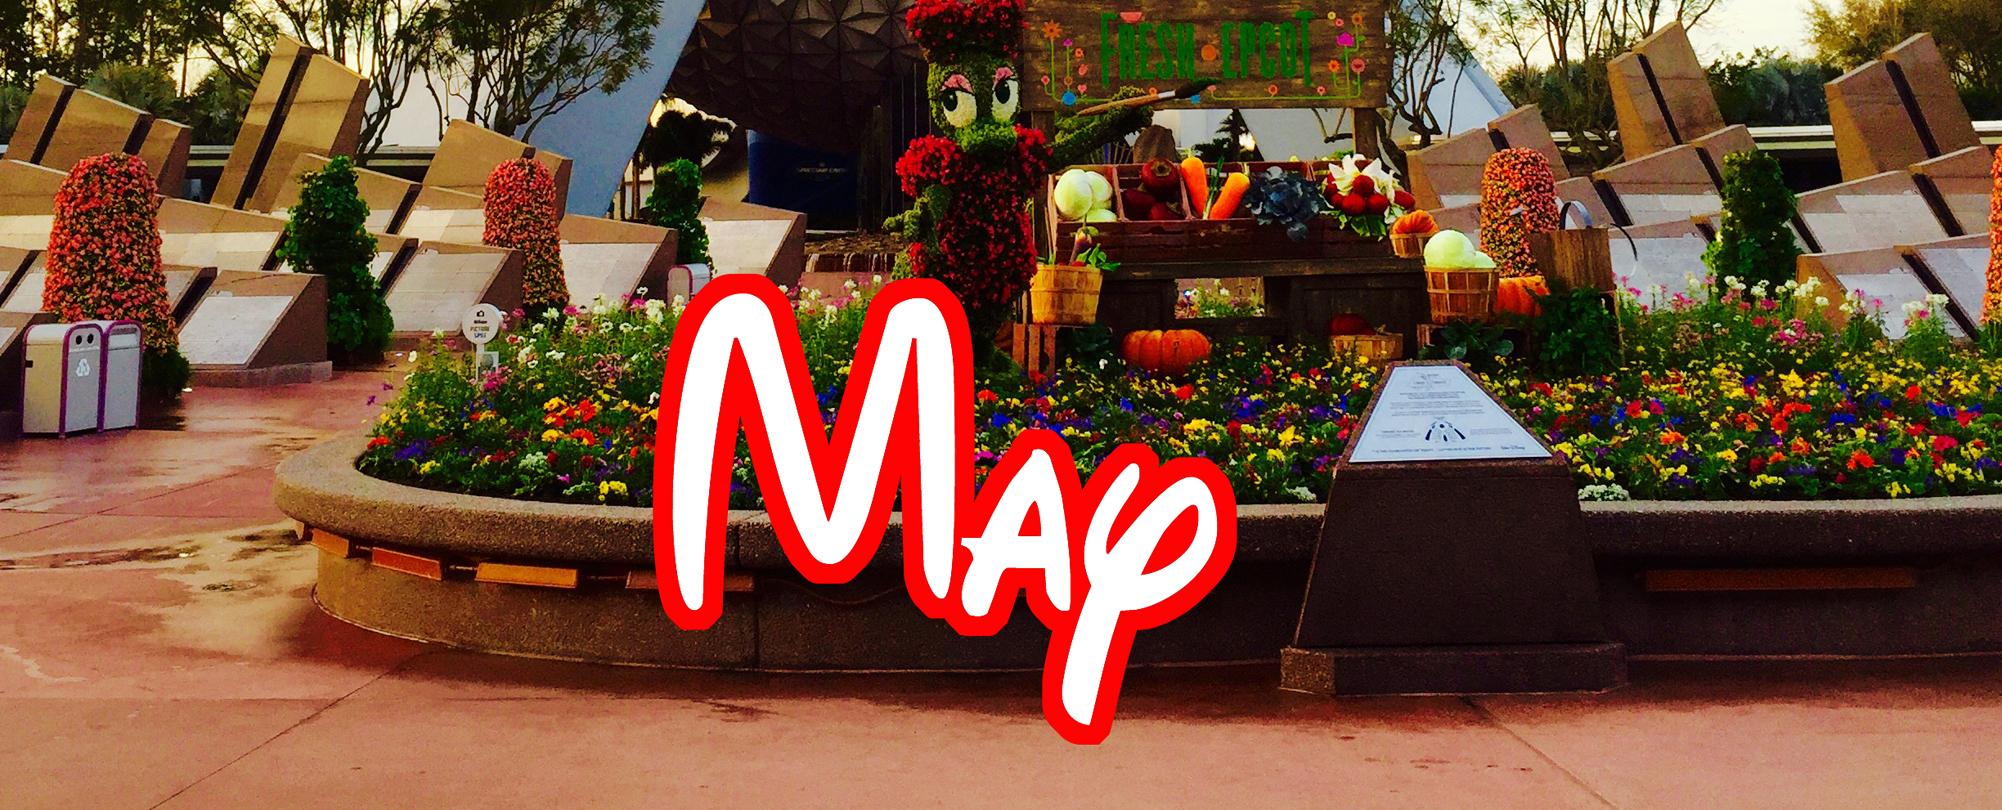 Disney World Vacation Planning